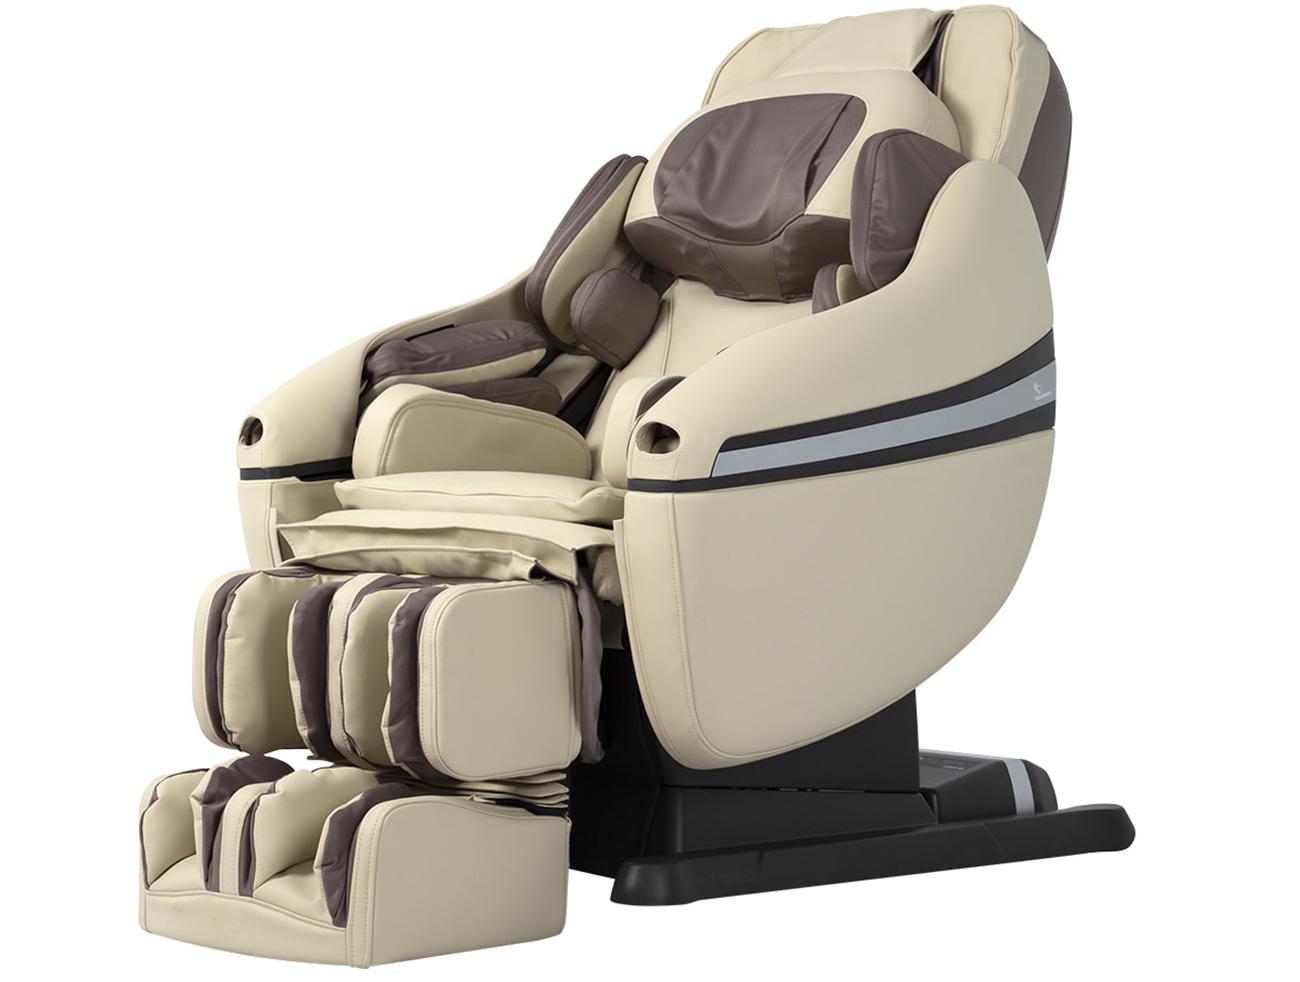 INADA 3D DREAMWAVE Massage Chair